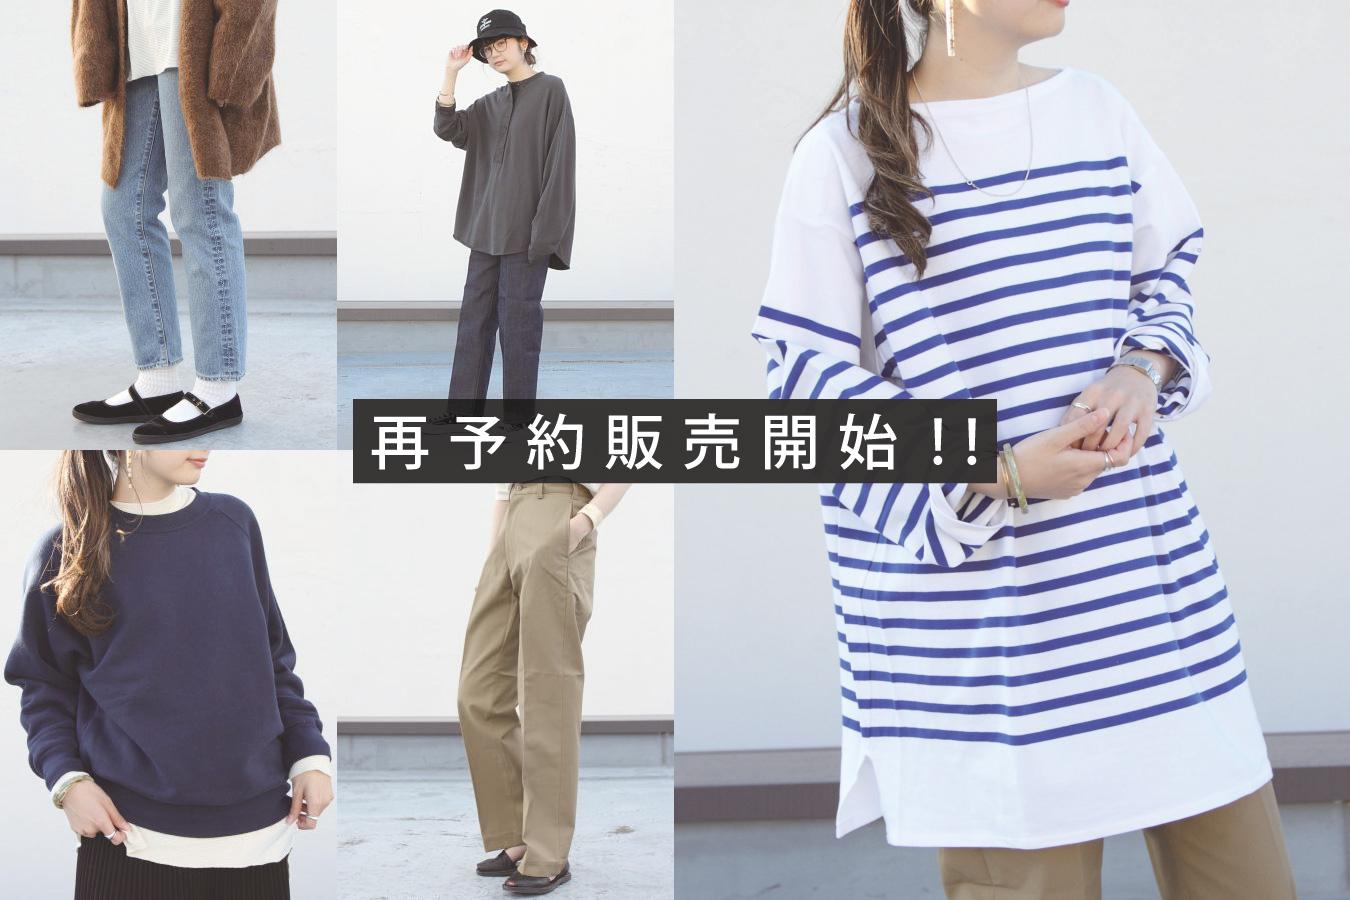 【早い者勝ち】人気完売商品、再予約販売開始!!